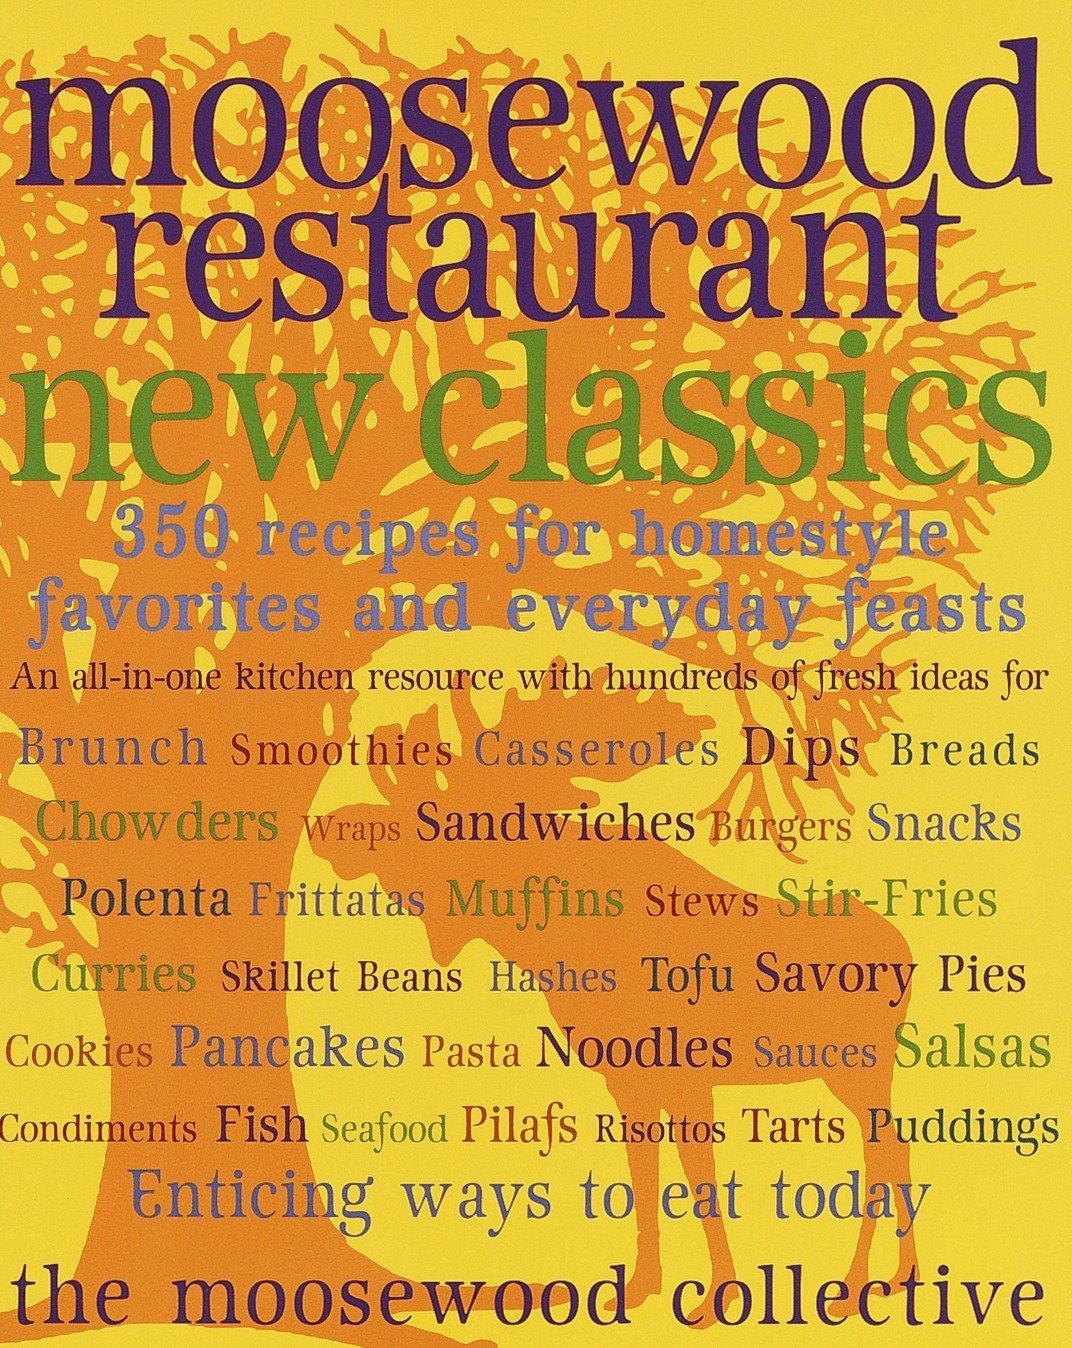 Moosewood Restaurant New Classics Moosewood Collective